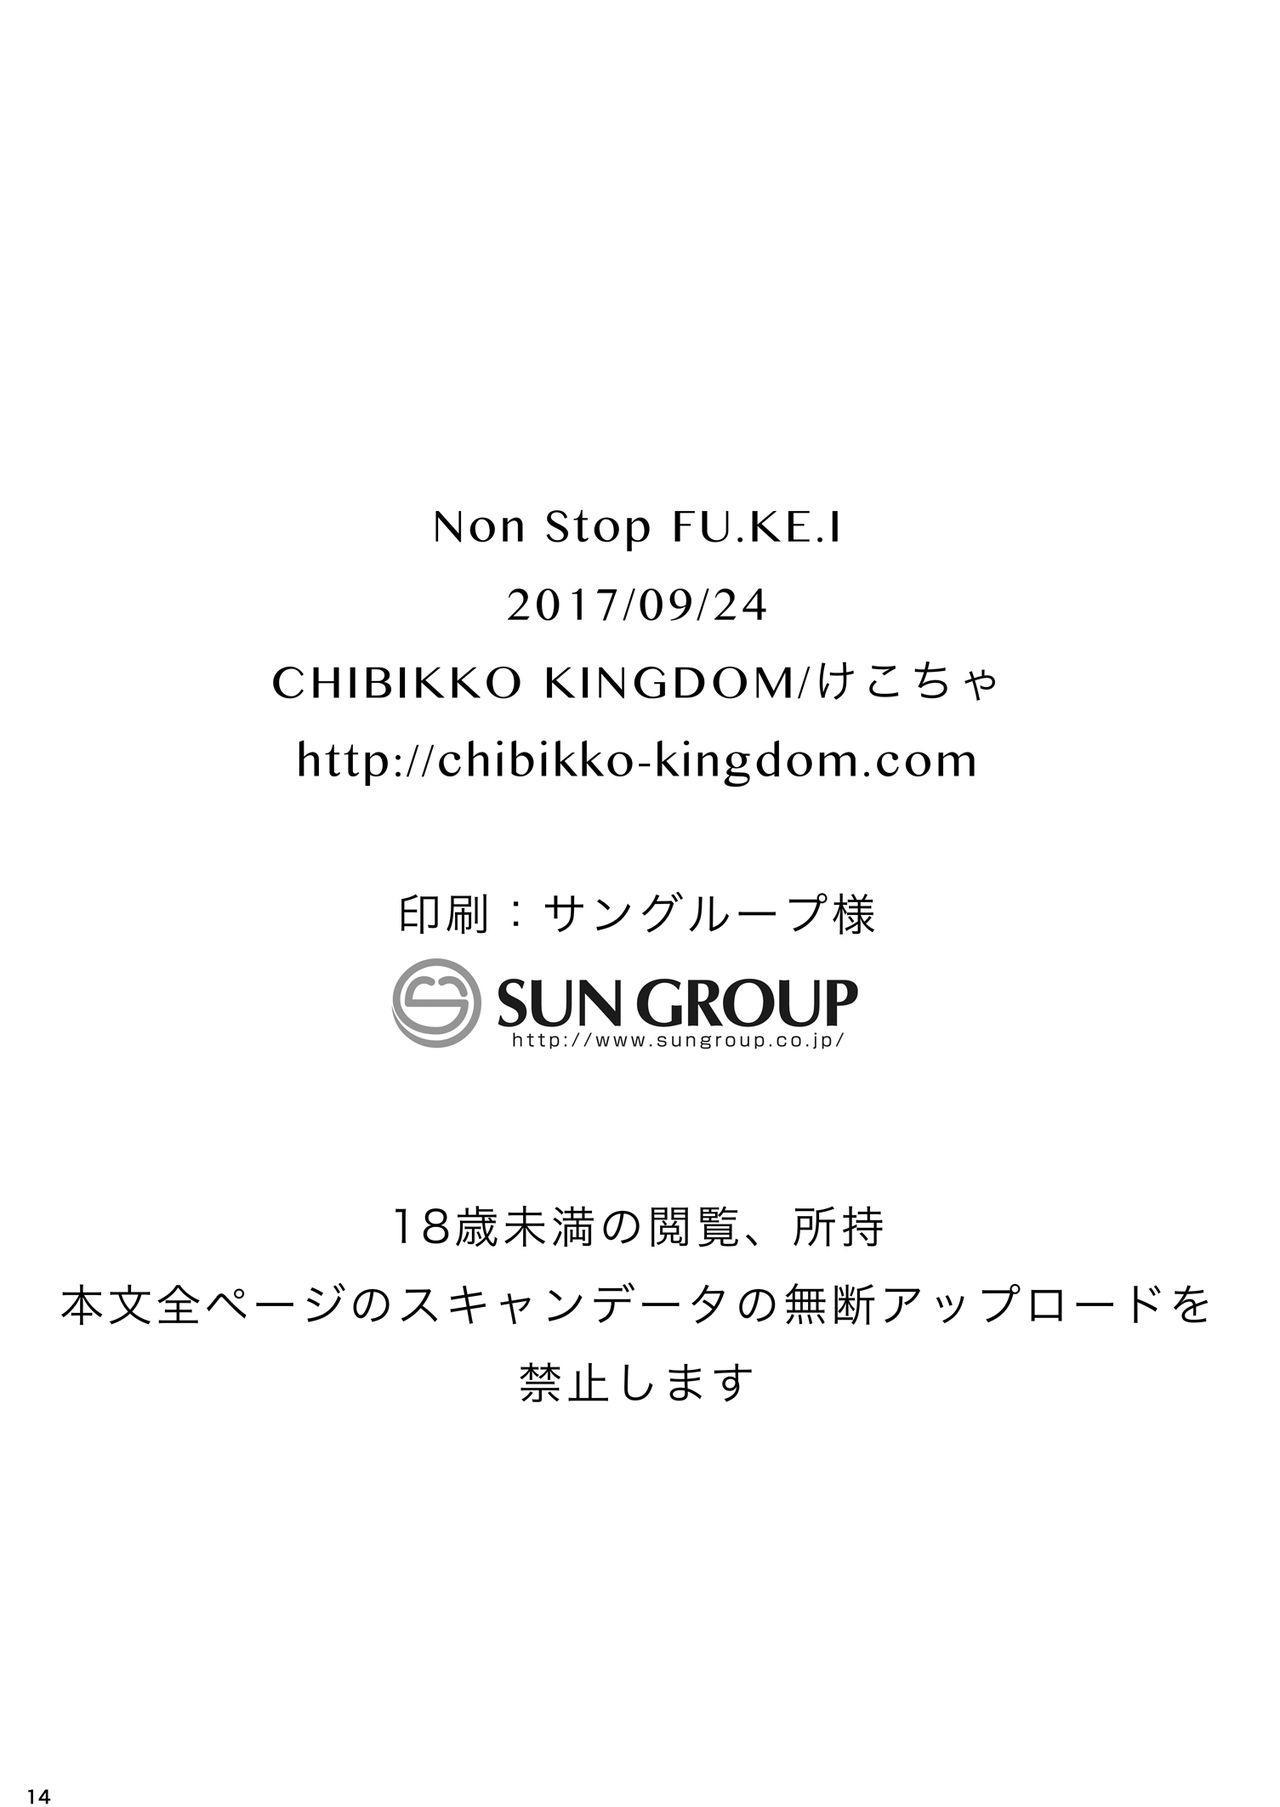 Non Stop FU.KE.I 12